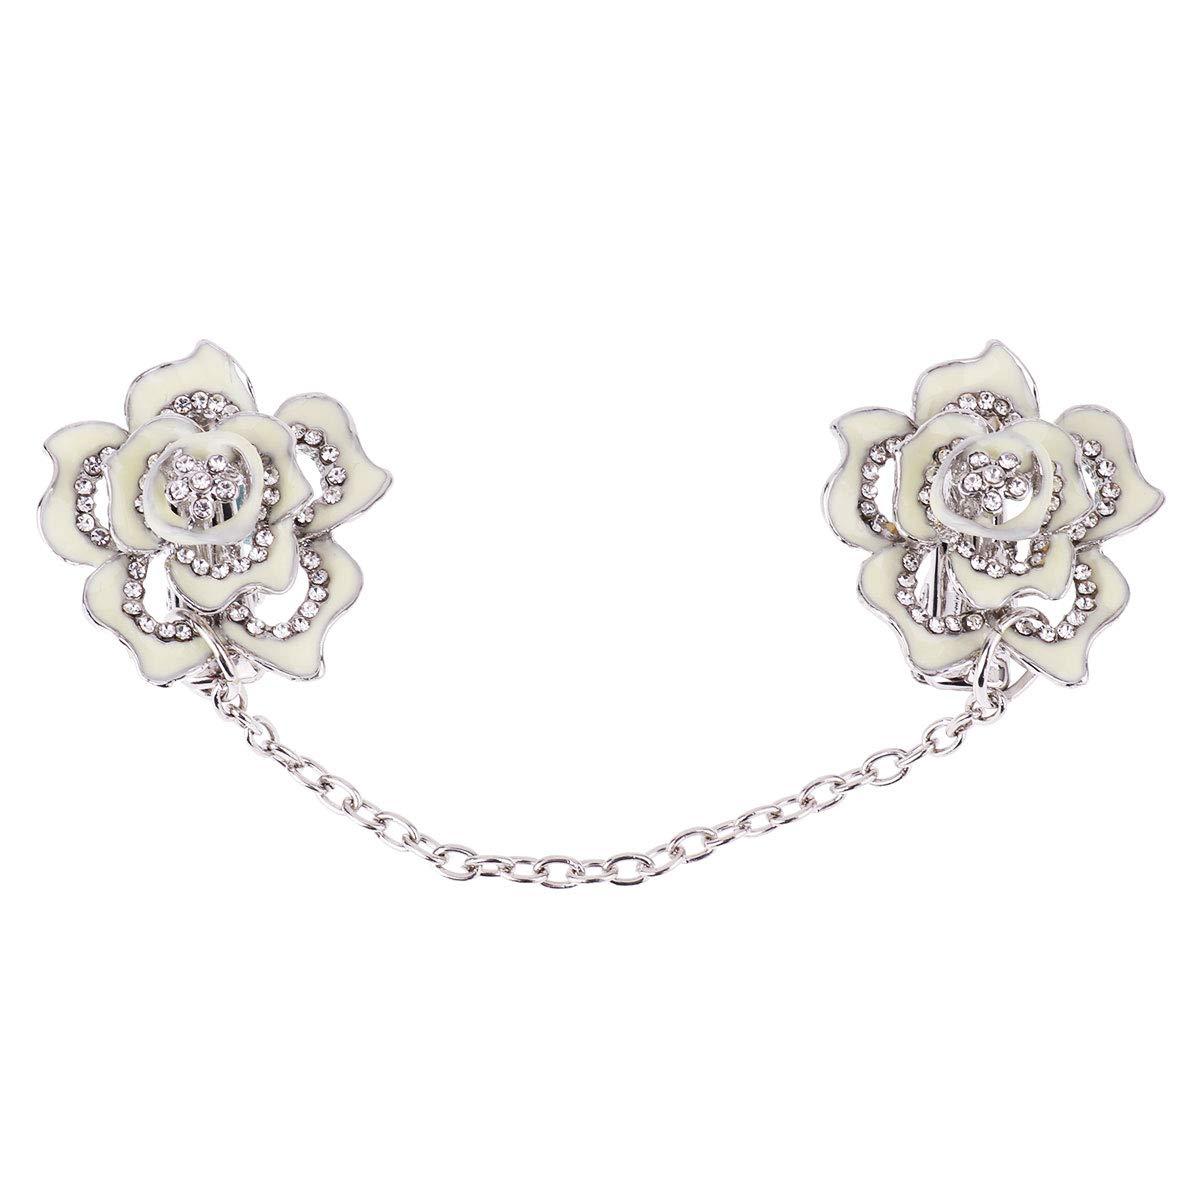 Iiniim Broches Pins Alliage Rose Fleur Femme Homme Clips Chale